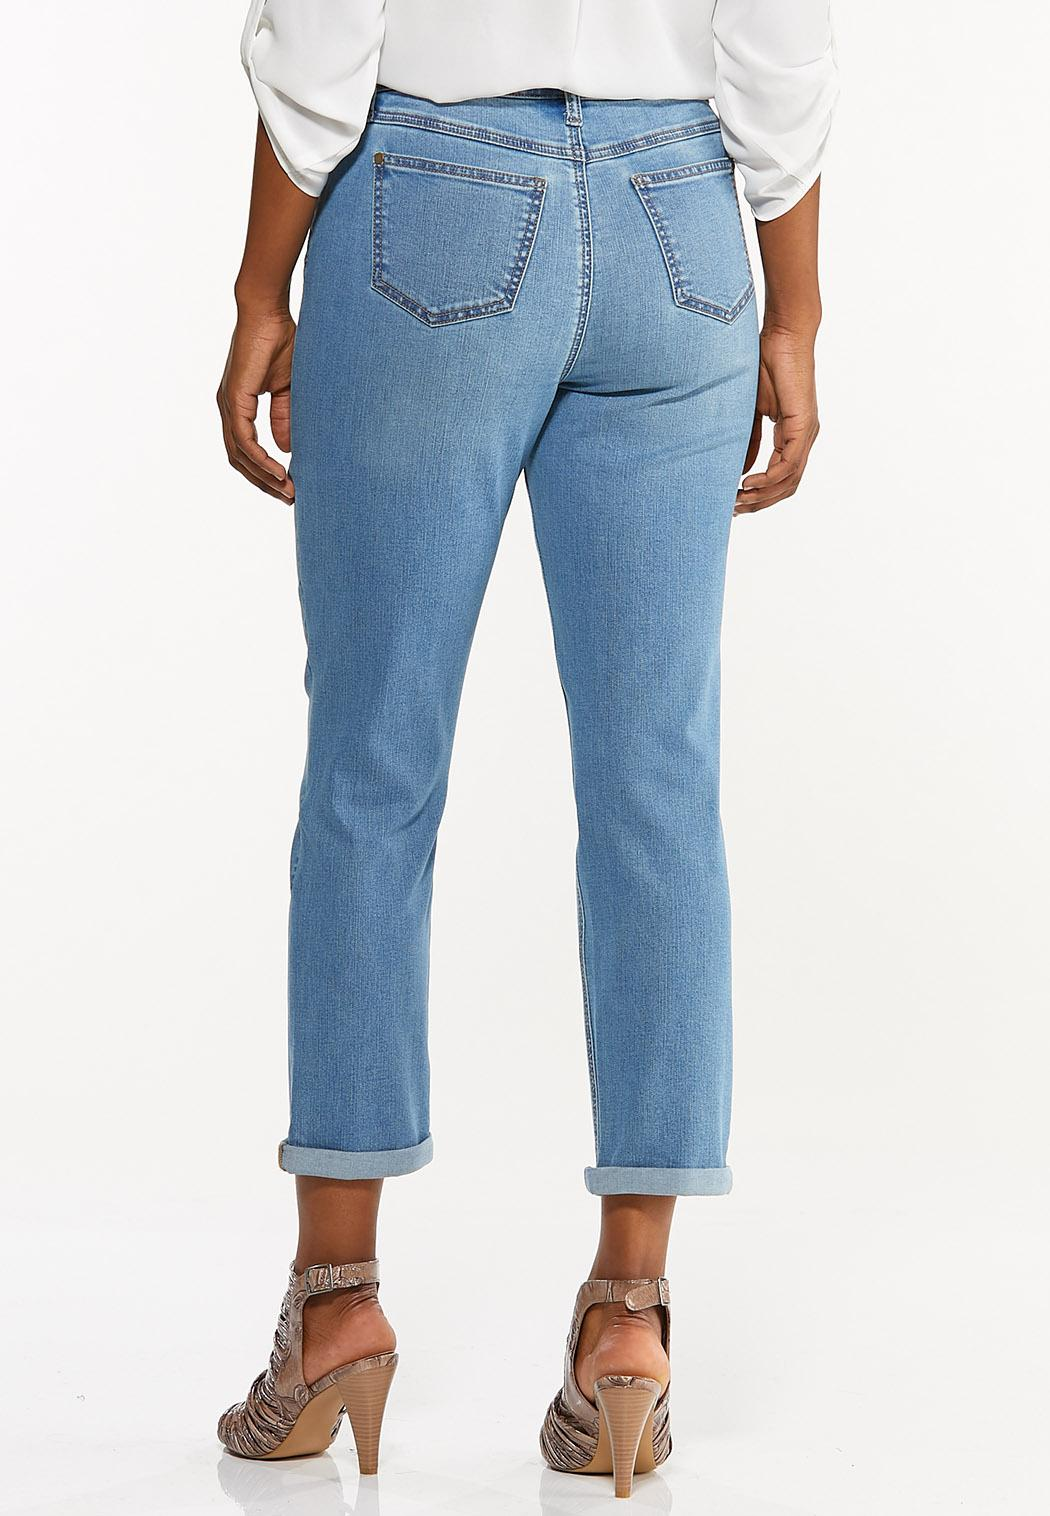 Casual Boyfriend Jeans (Item #44500013)